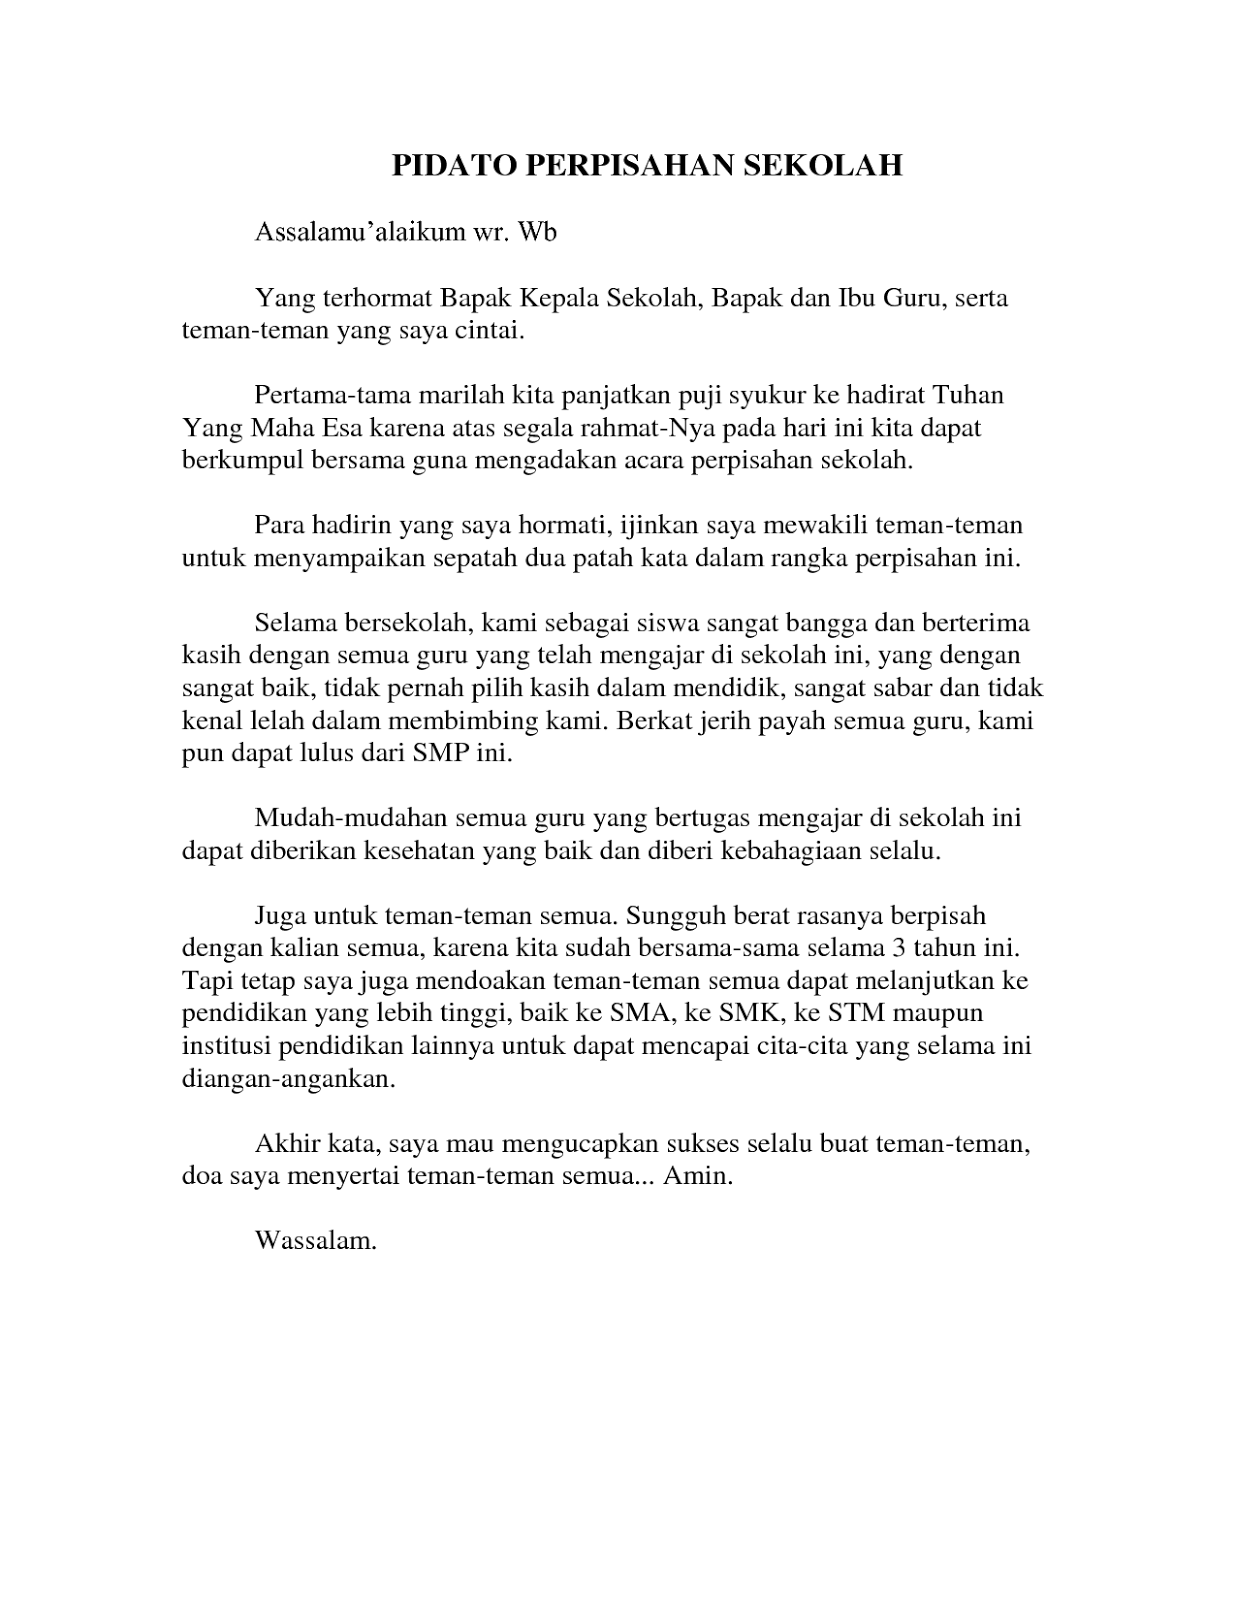 Pidato Tentang Perpisahan : pidato, tentang, perpisahan, CONTOH, PIDATO, PERPISAHAN, KELAS, (enam)